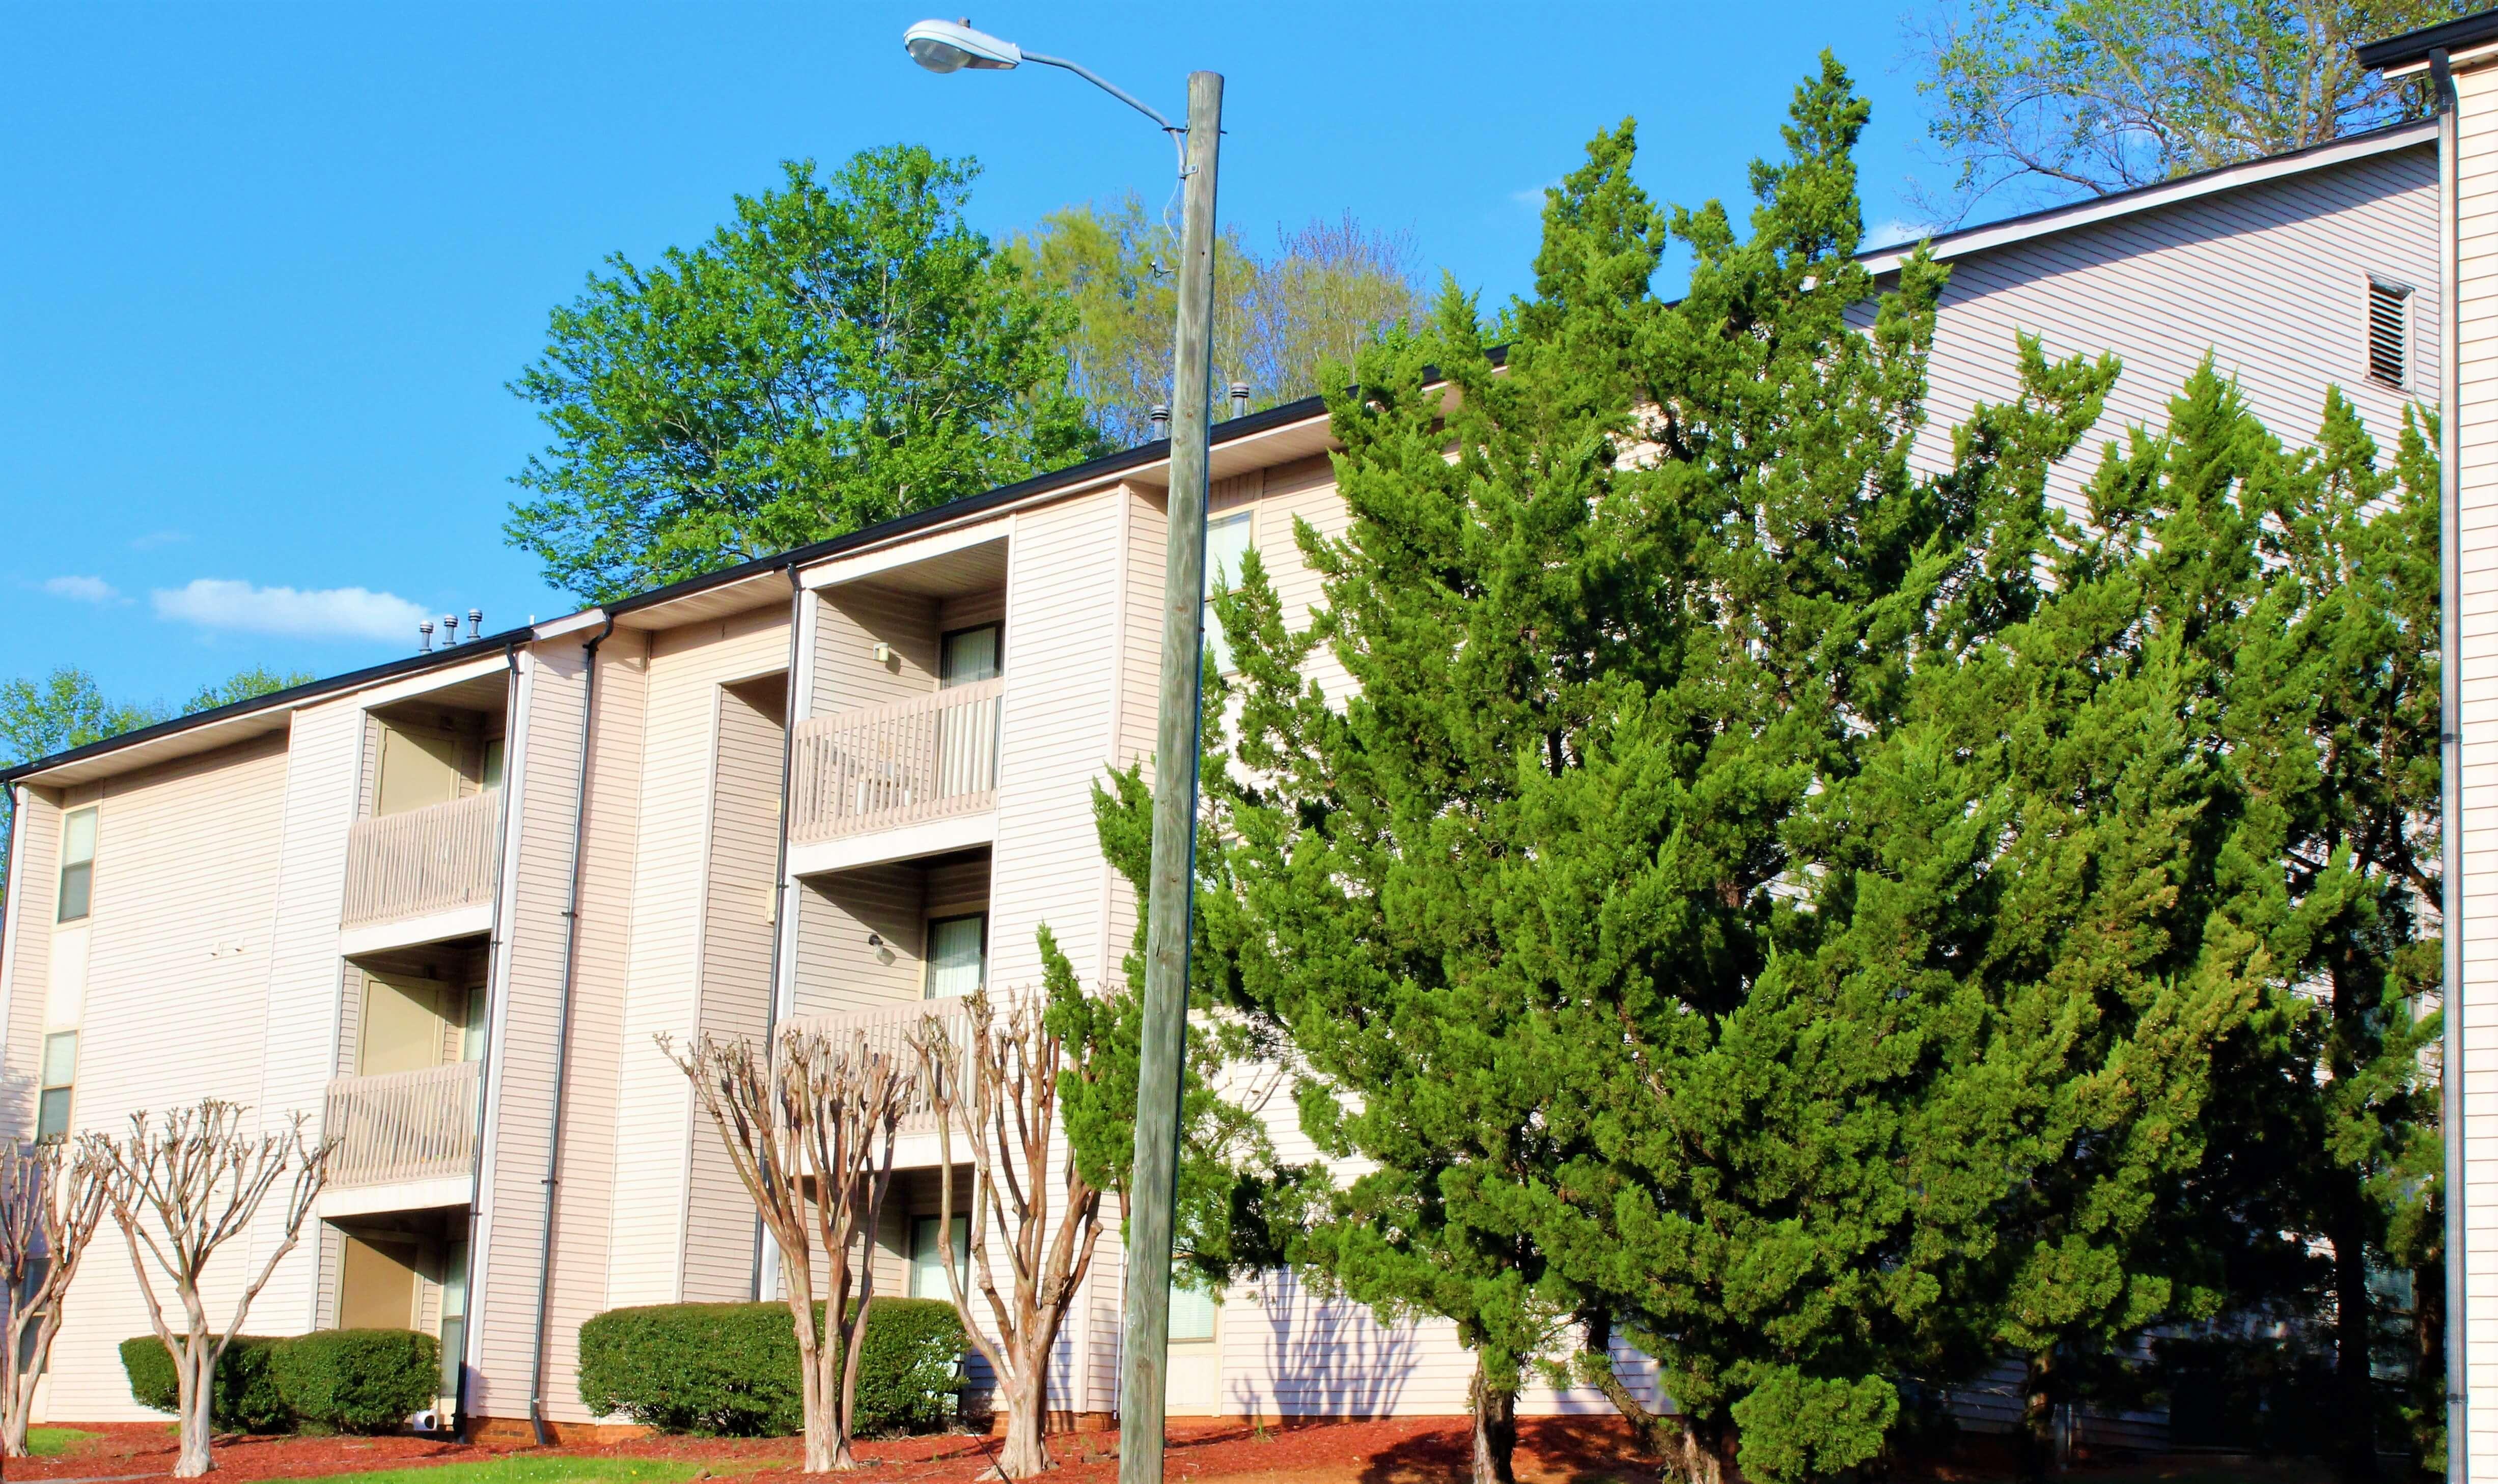 Image of Gardner Ridge Apartments in Gastonia, North Carolina